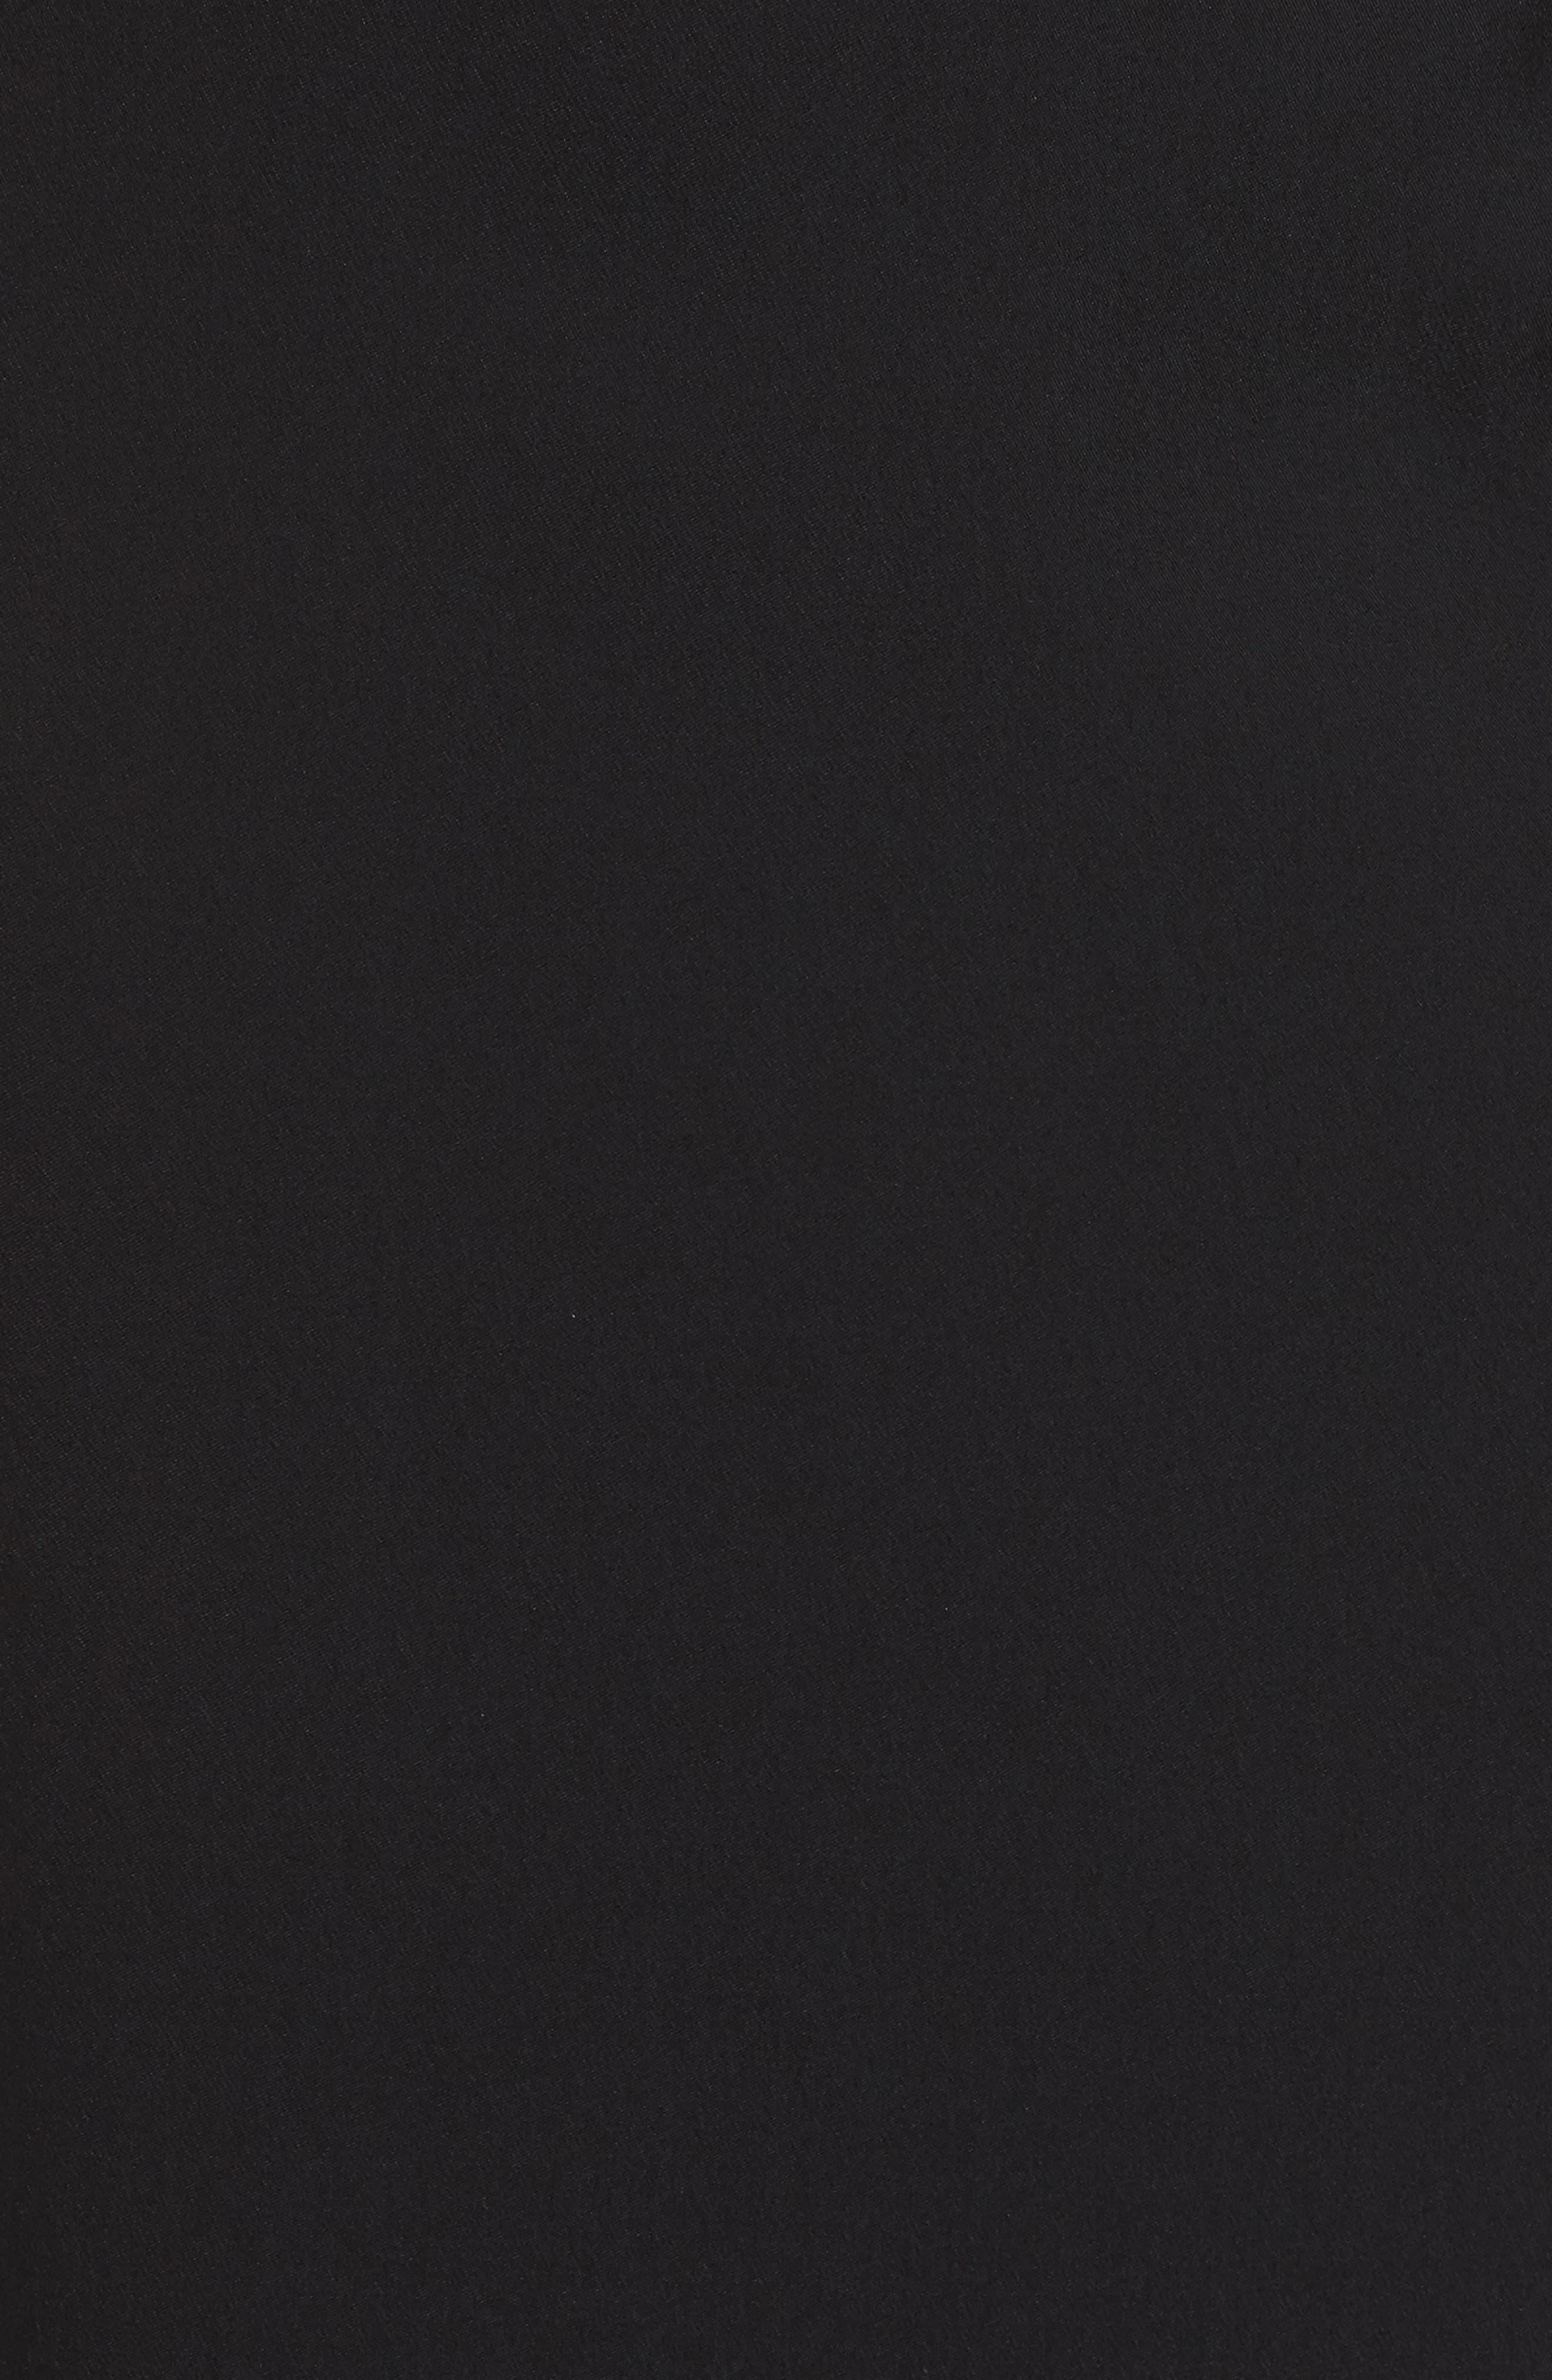 Crepe & Sequin Gown,                             Alternate thumbnail 6, color,                             BLACK/ GOLD